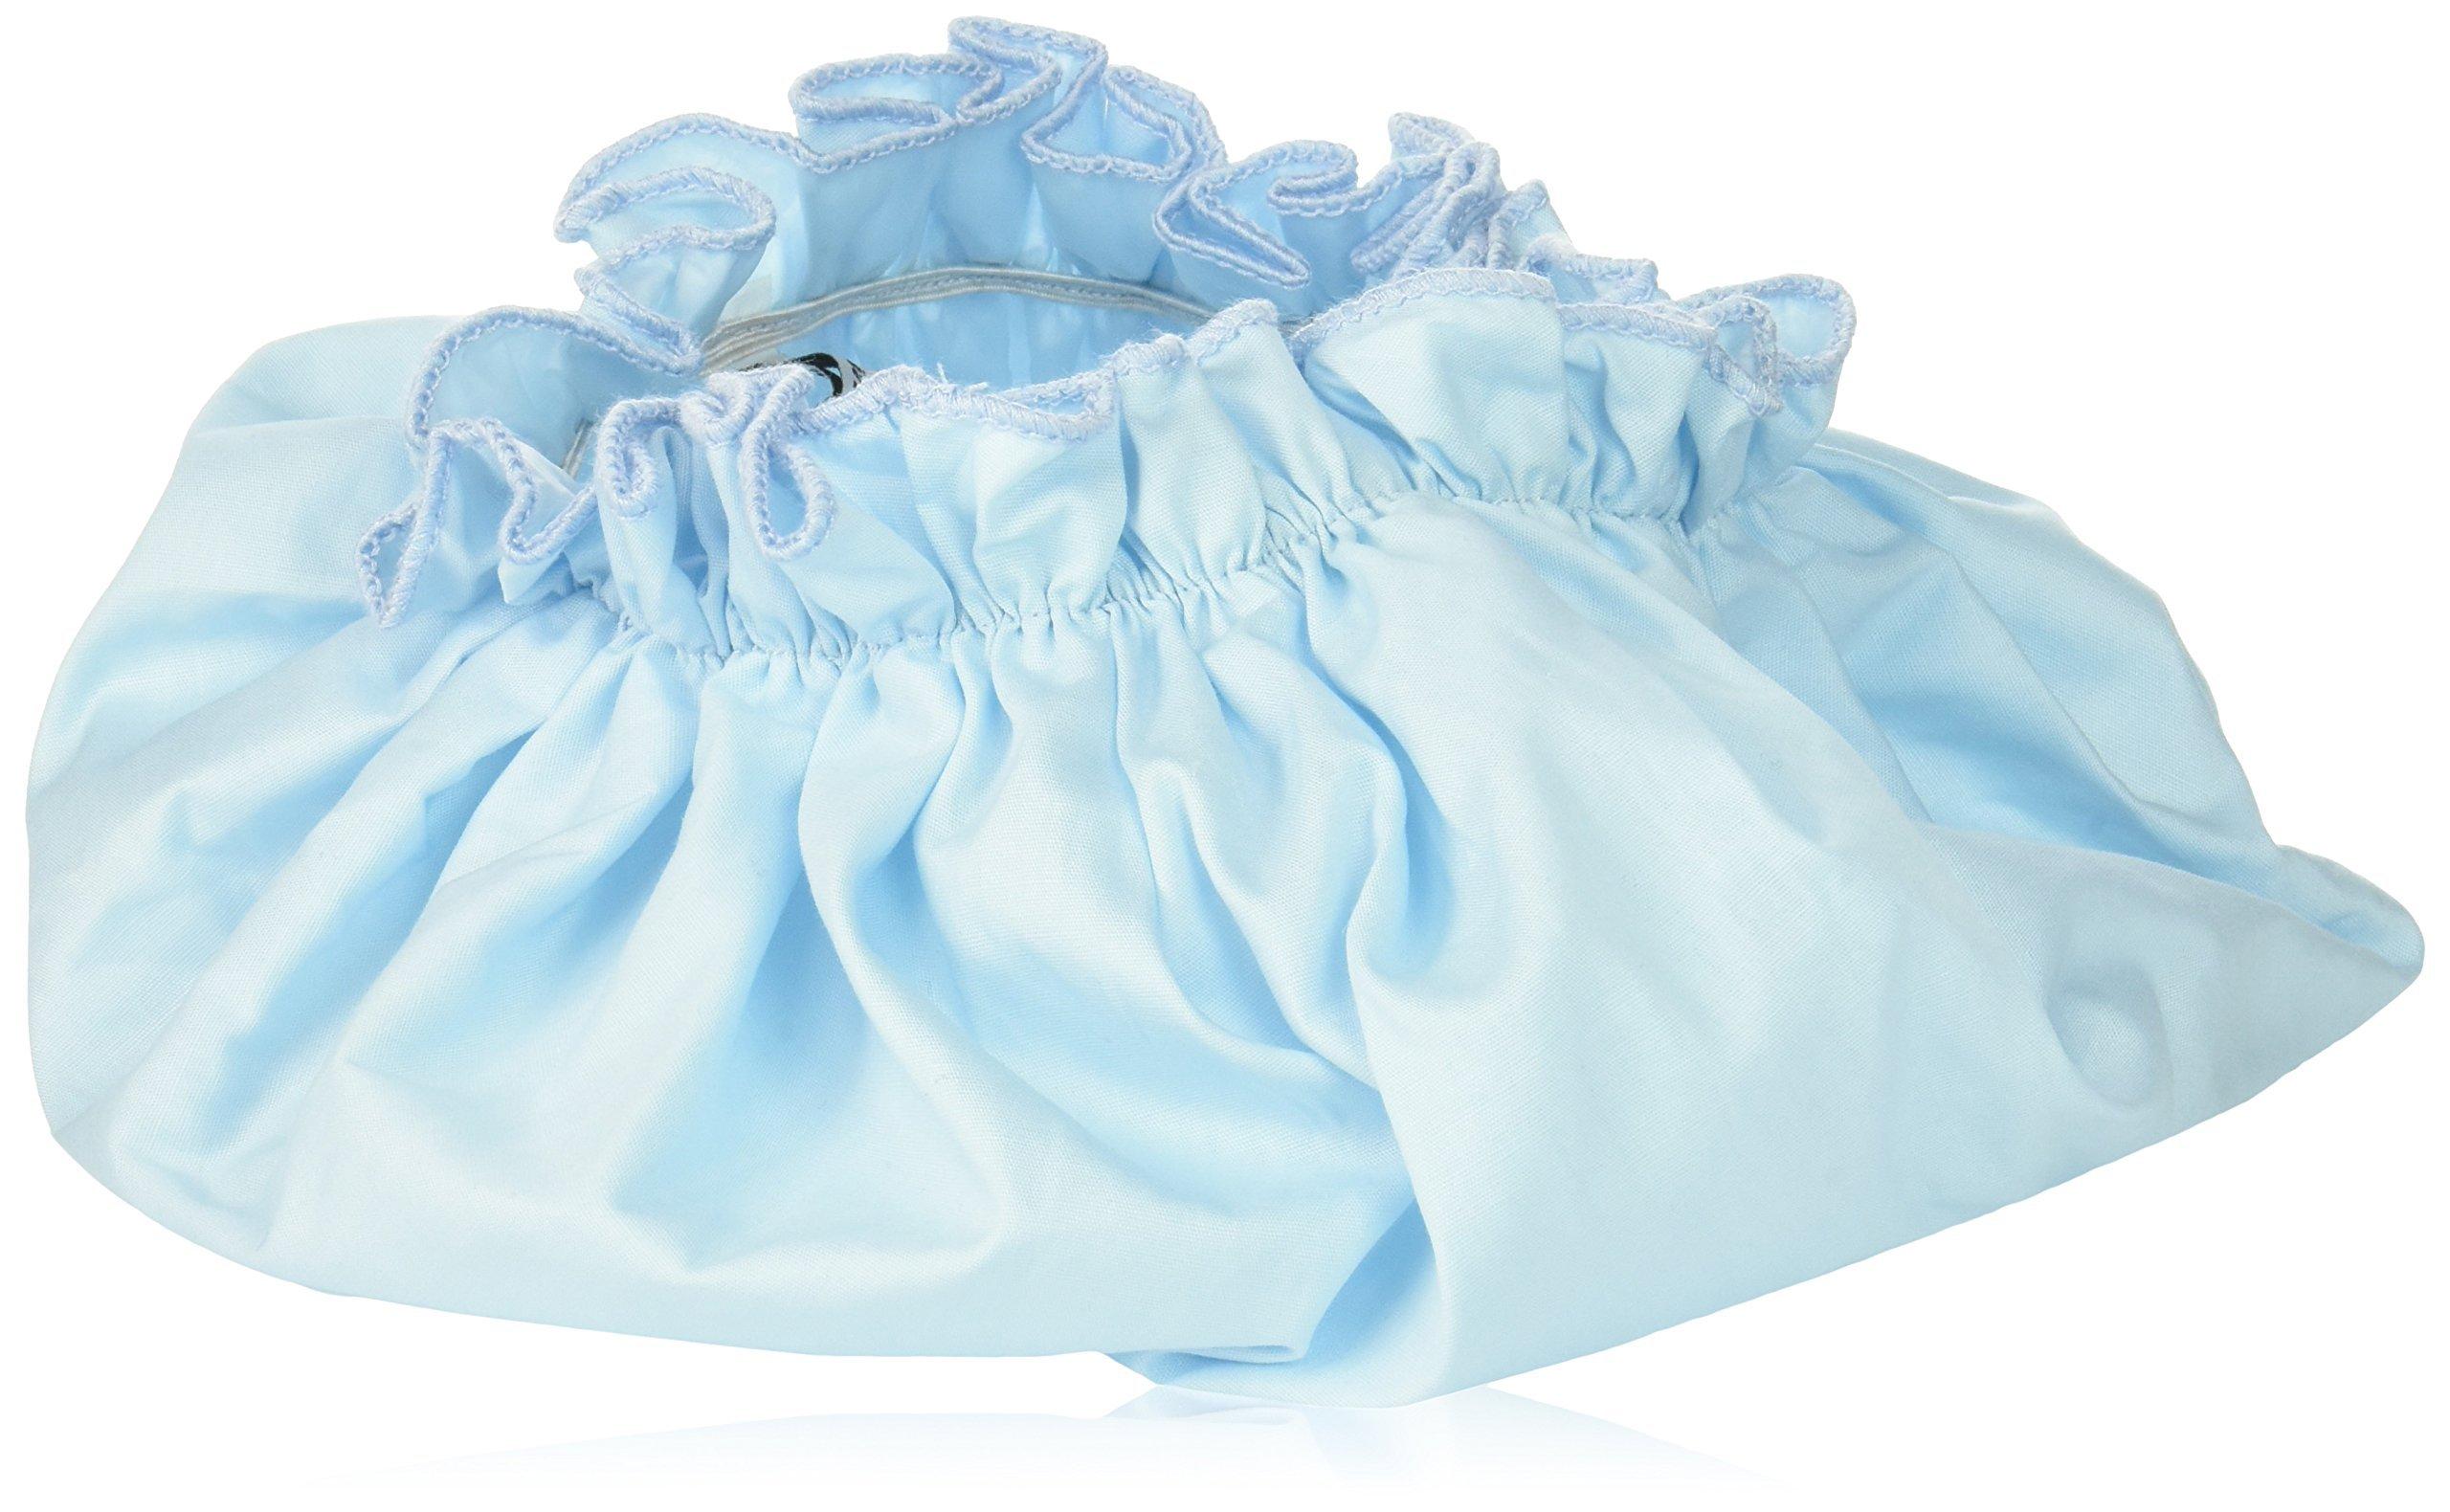 Bouffant Shower Cap-Blue